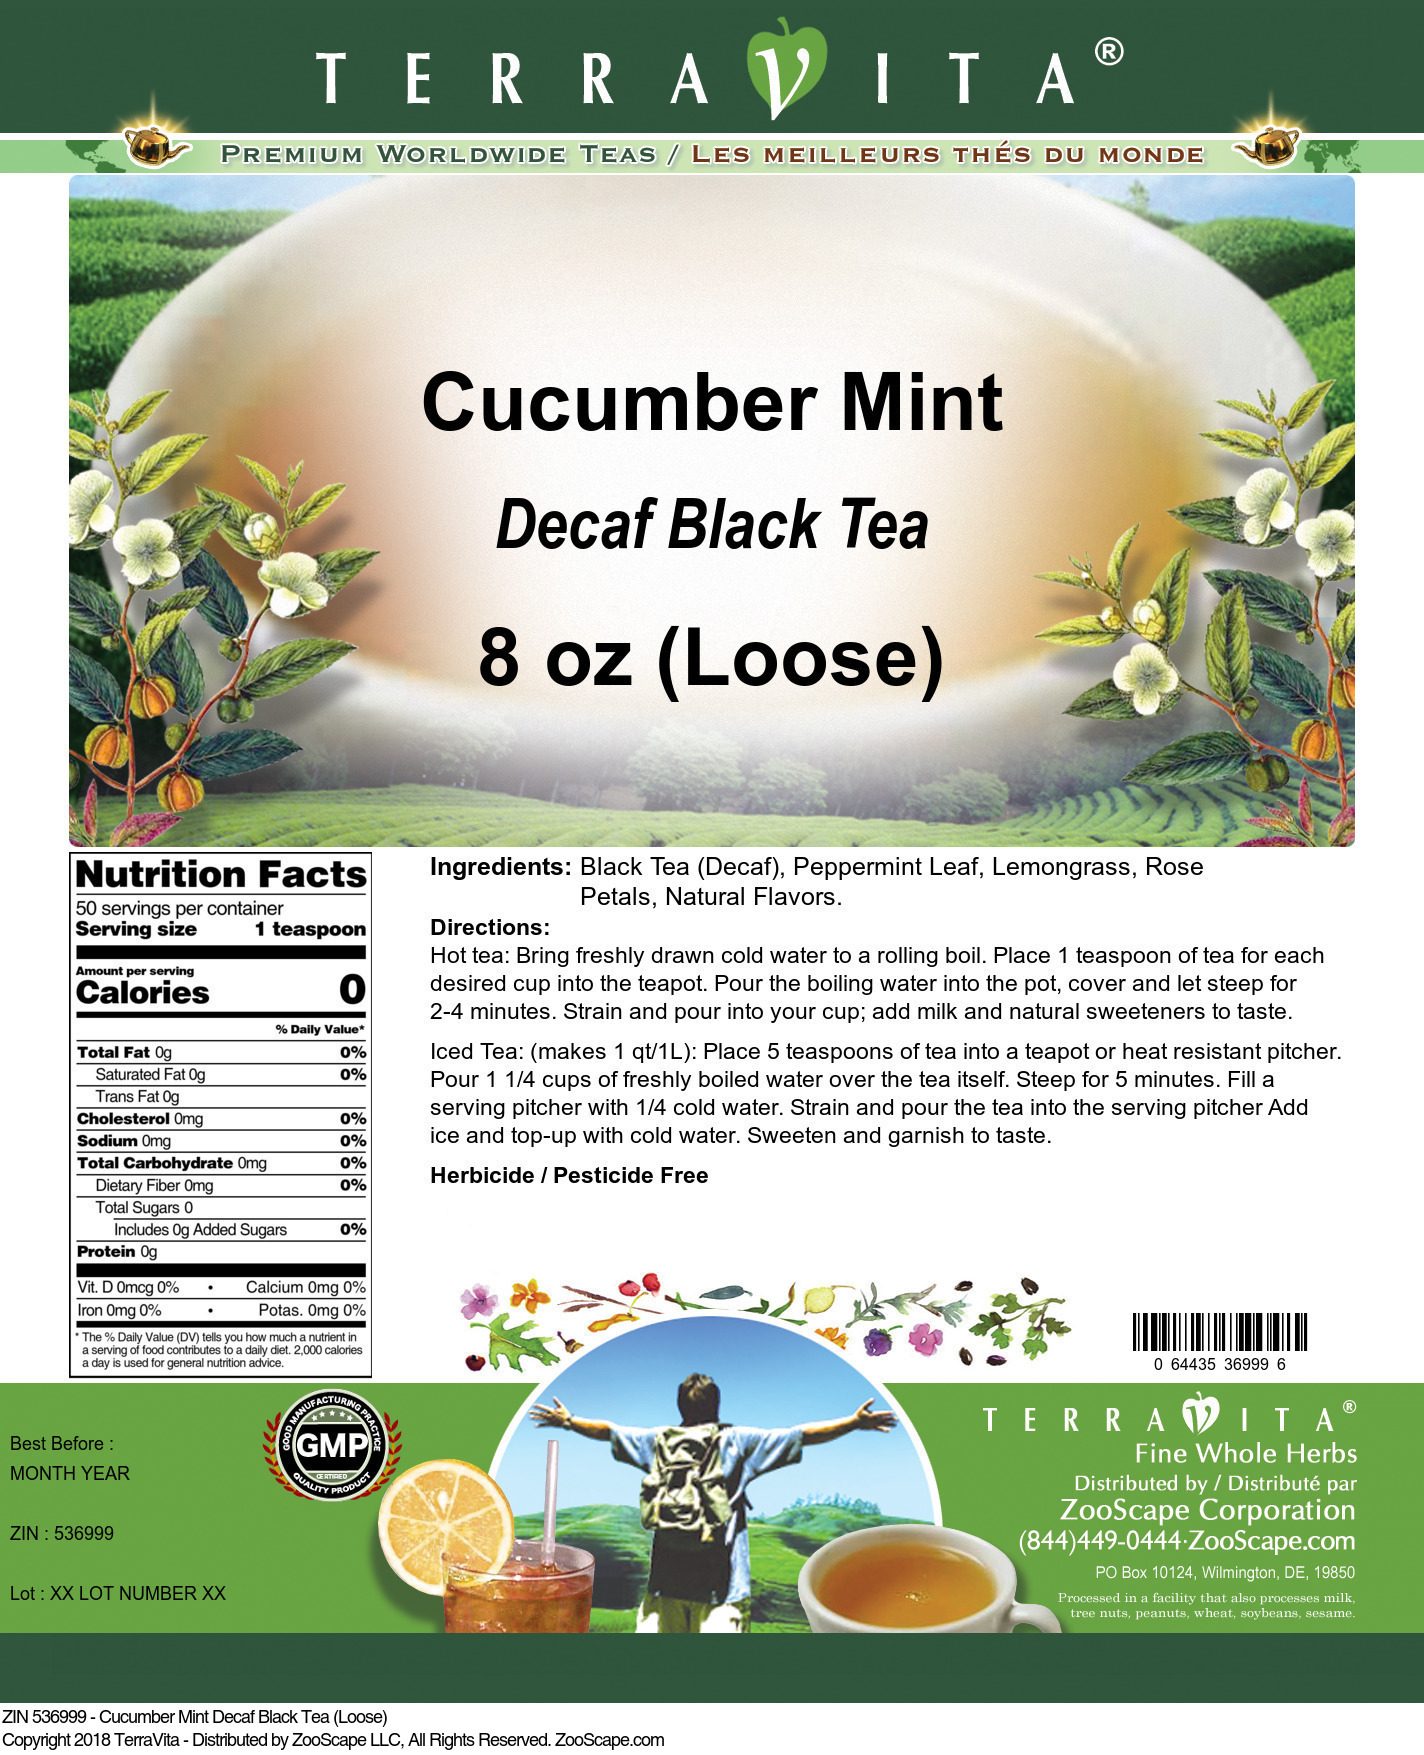 Cucumber Mint Decaf Black Tea